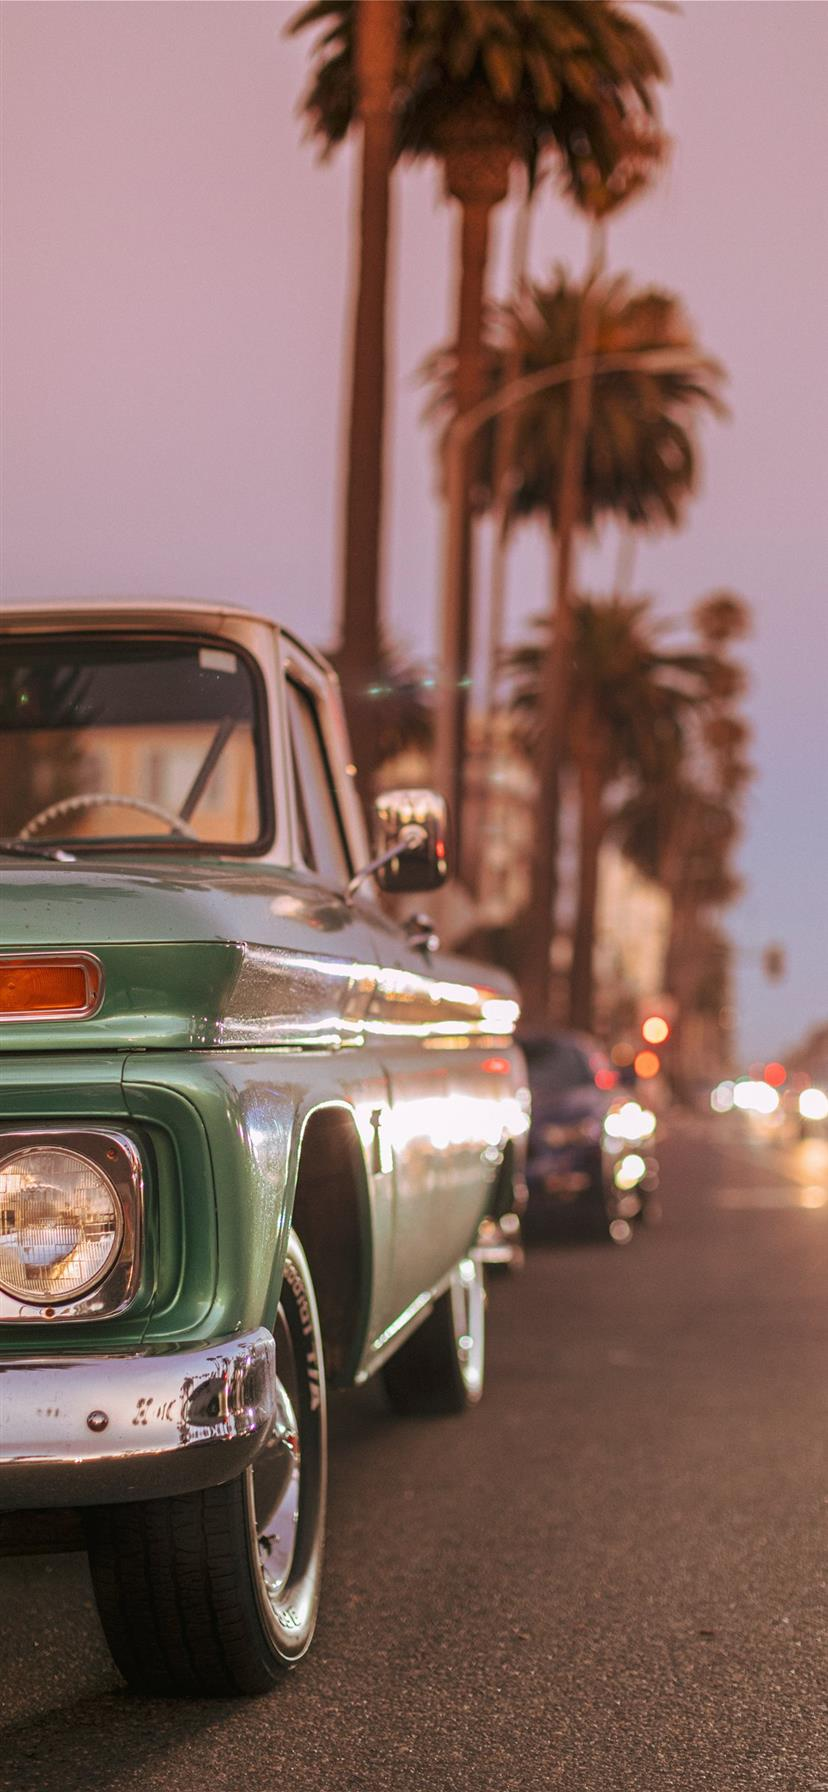 Vintage car parked on Ocean Blvd during sunset  iphone 11 wallpaper